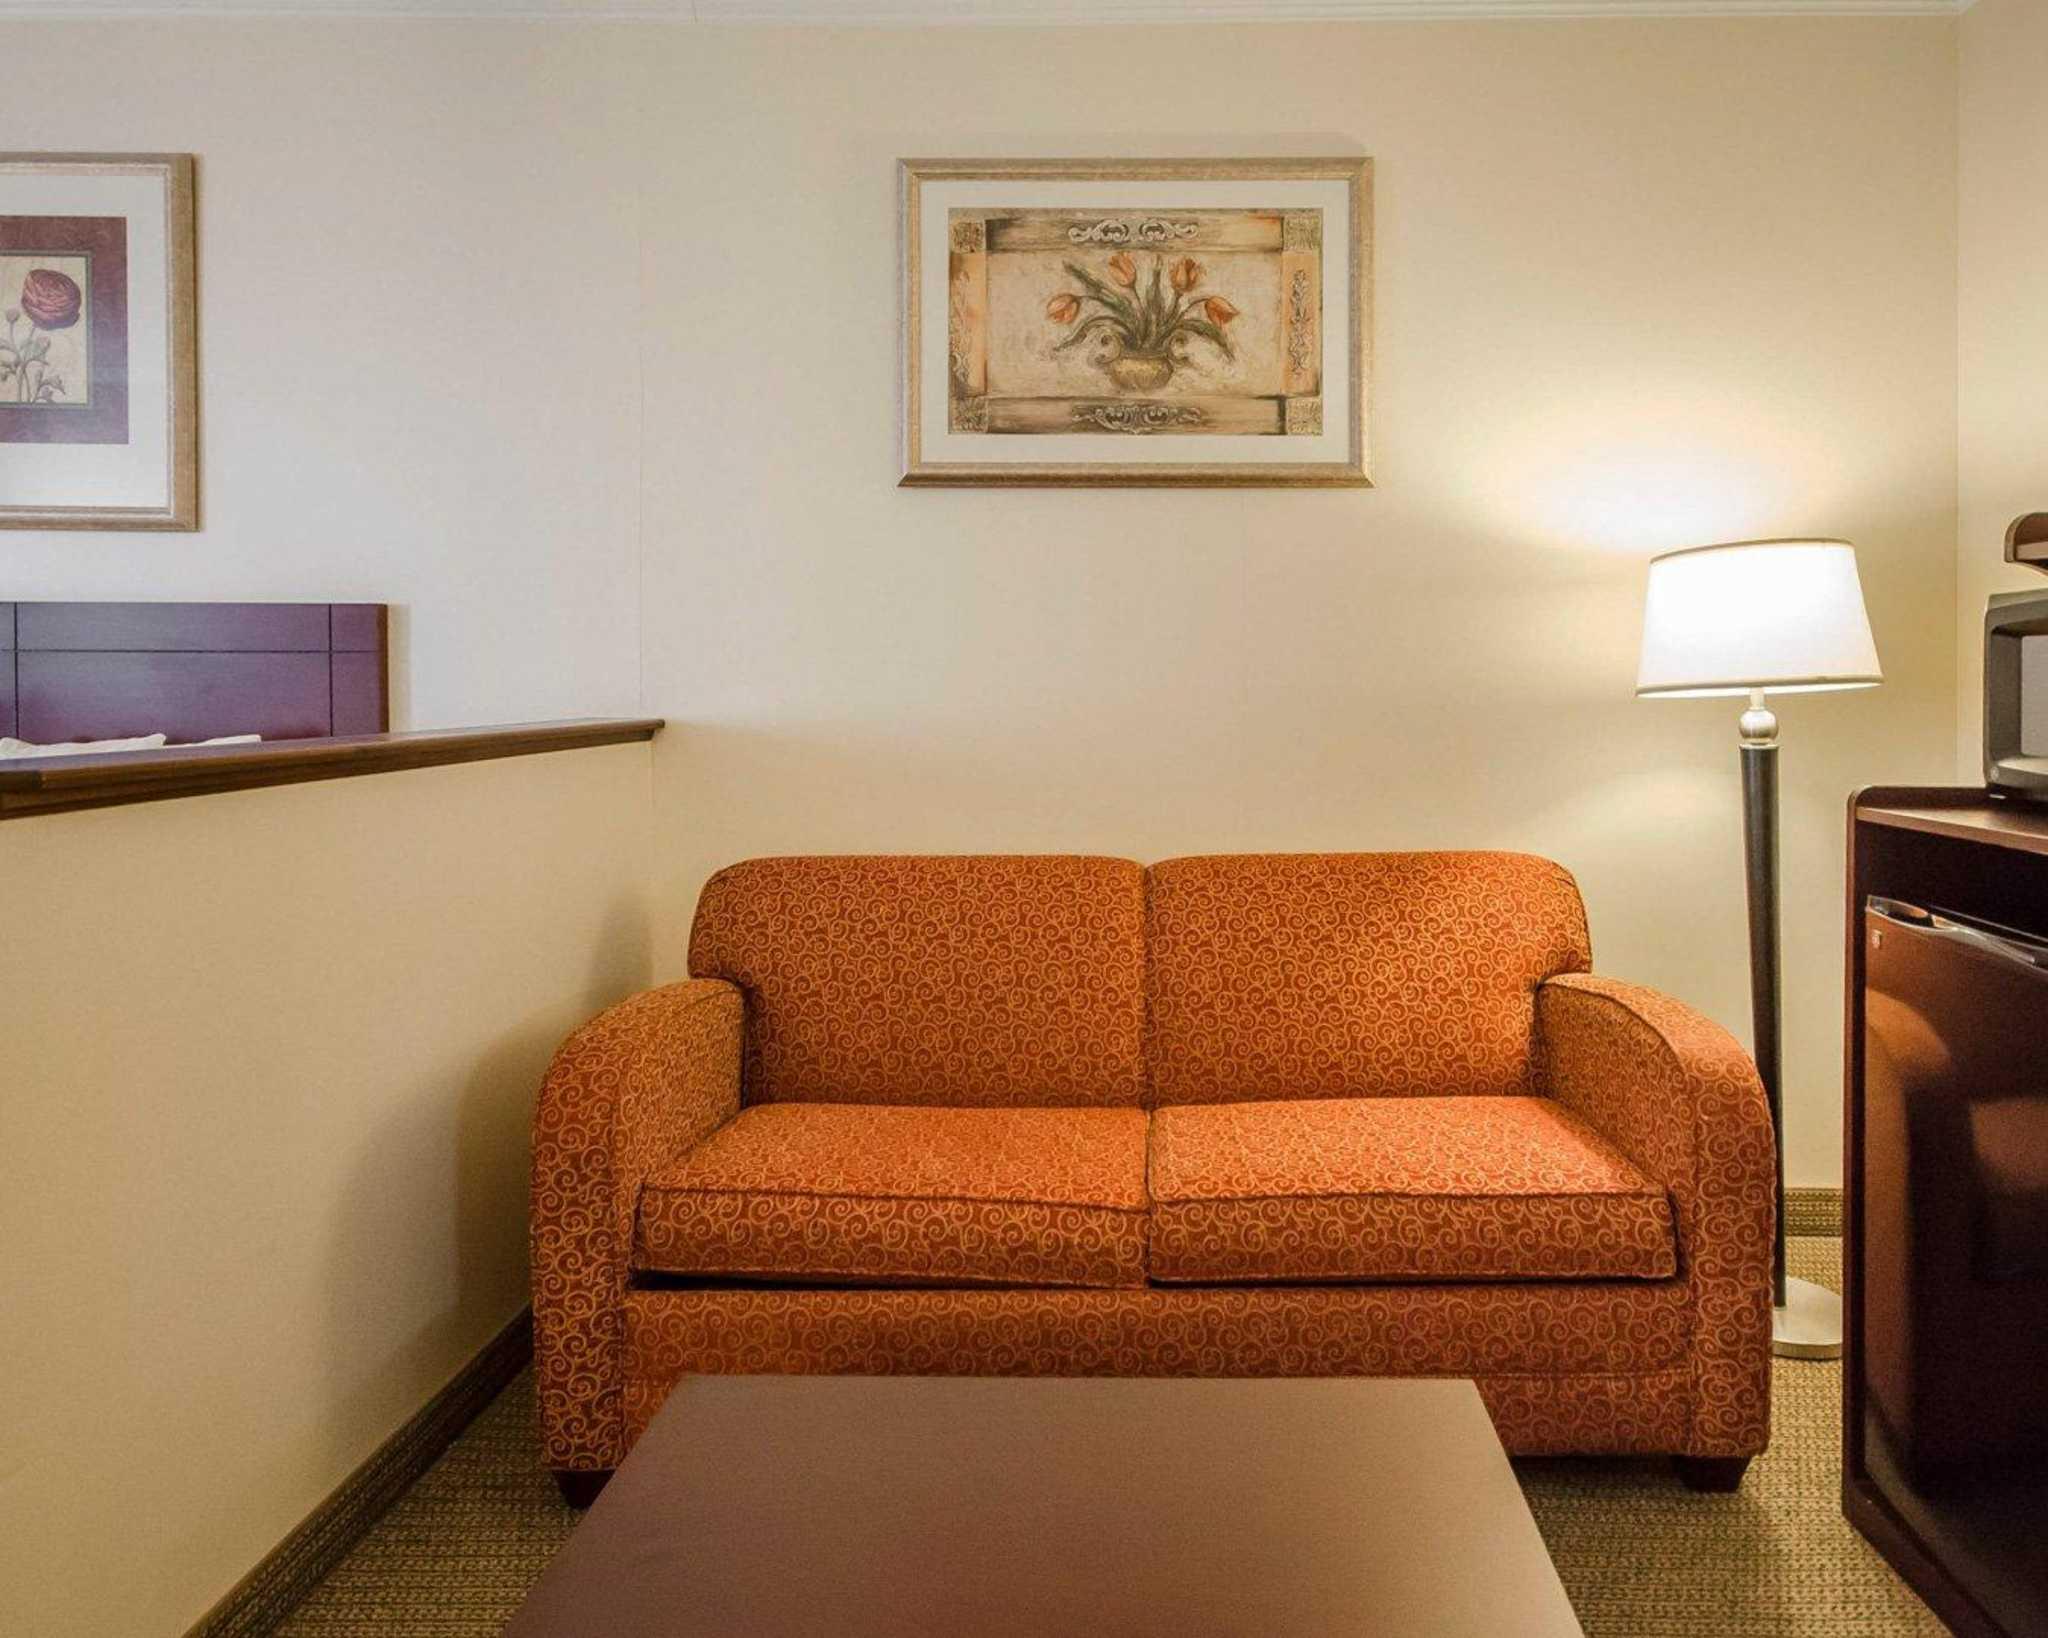 Quality Suites image 8